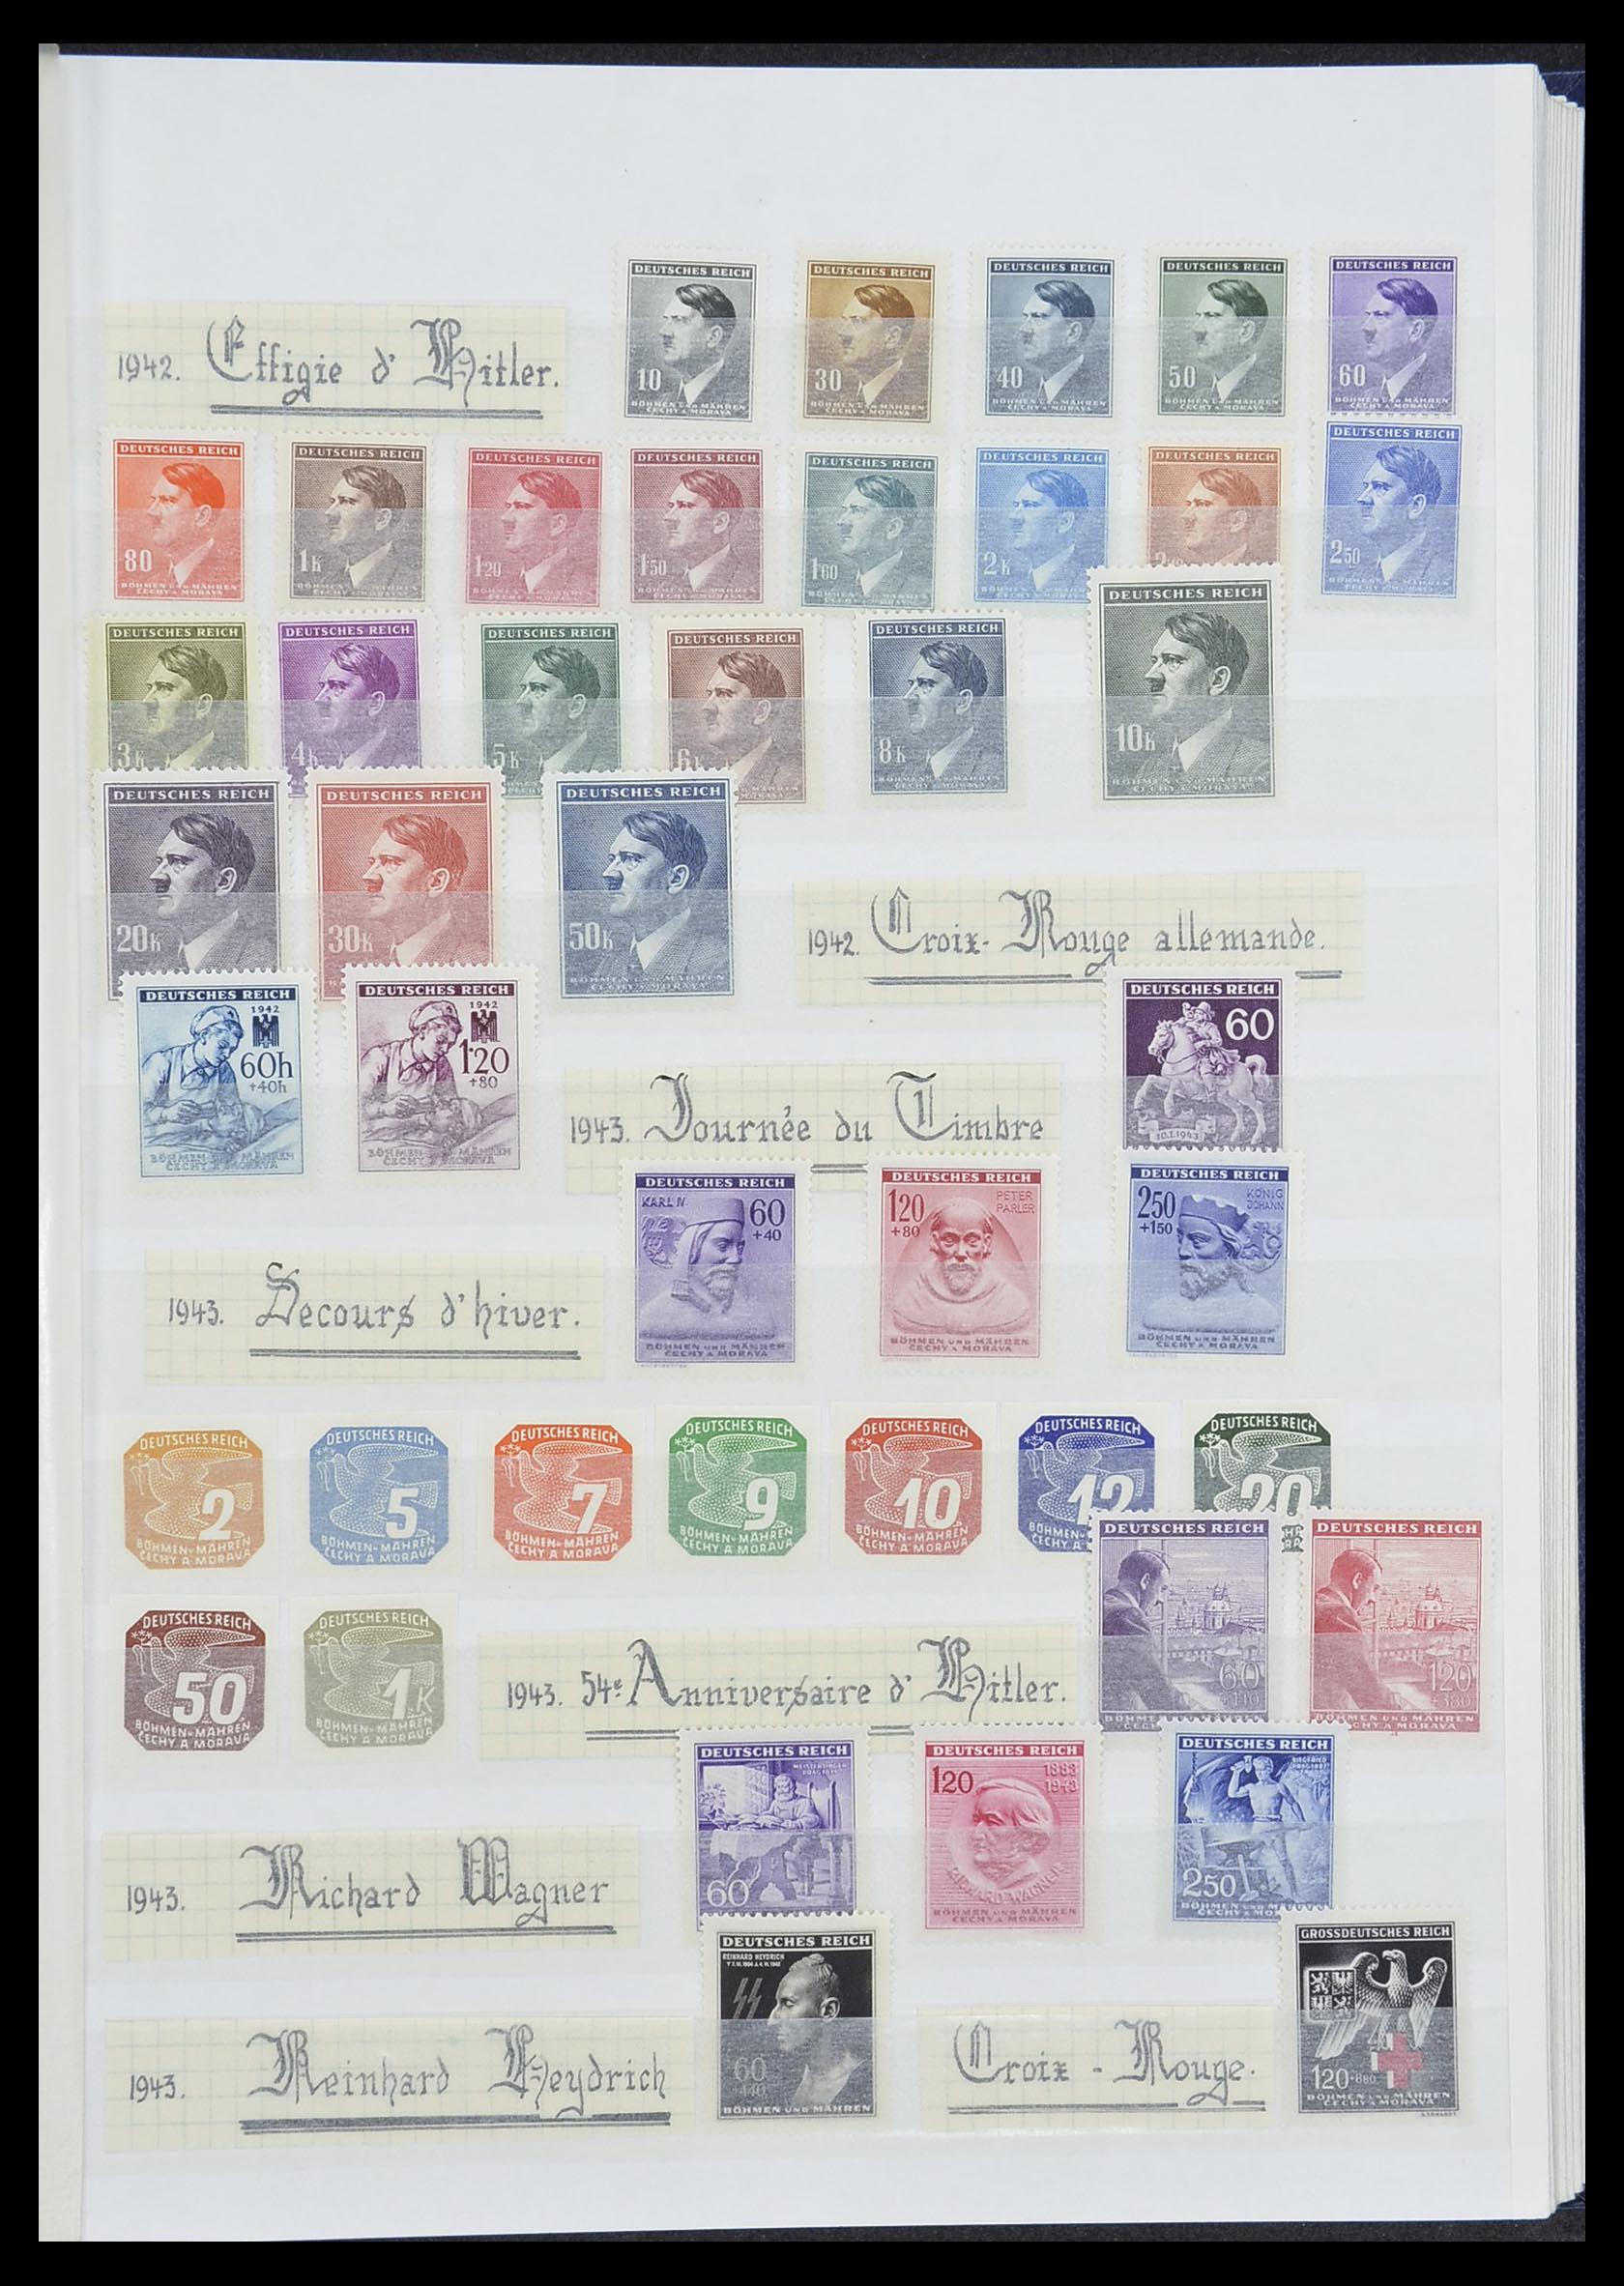 33850 011 - Postzegelverzameling 33850 Duitse bezettingen 2e wereldoorlog 1939-19